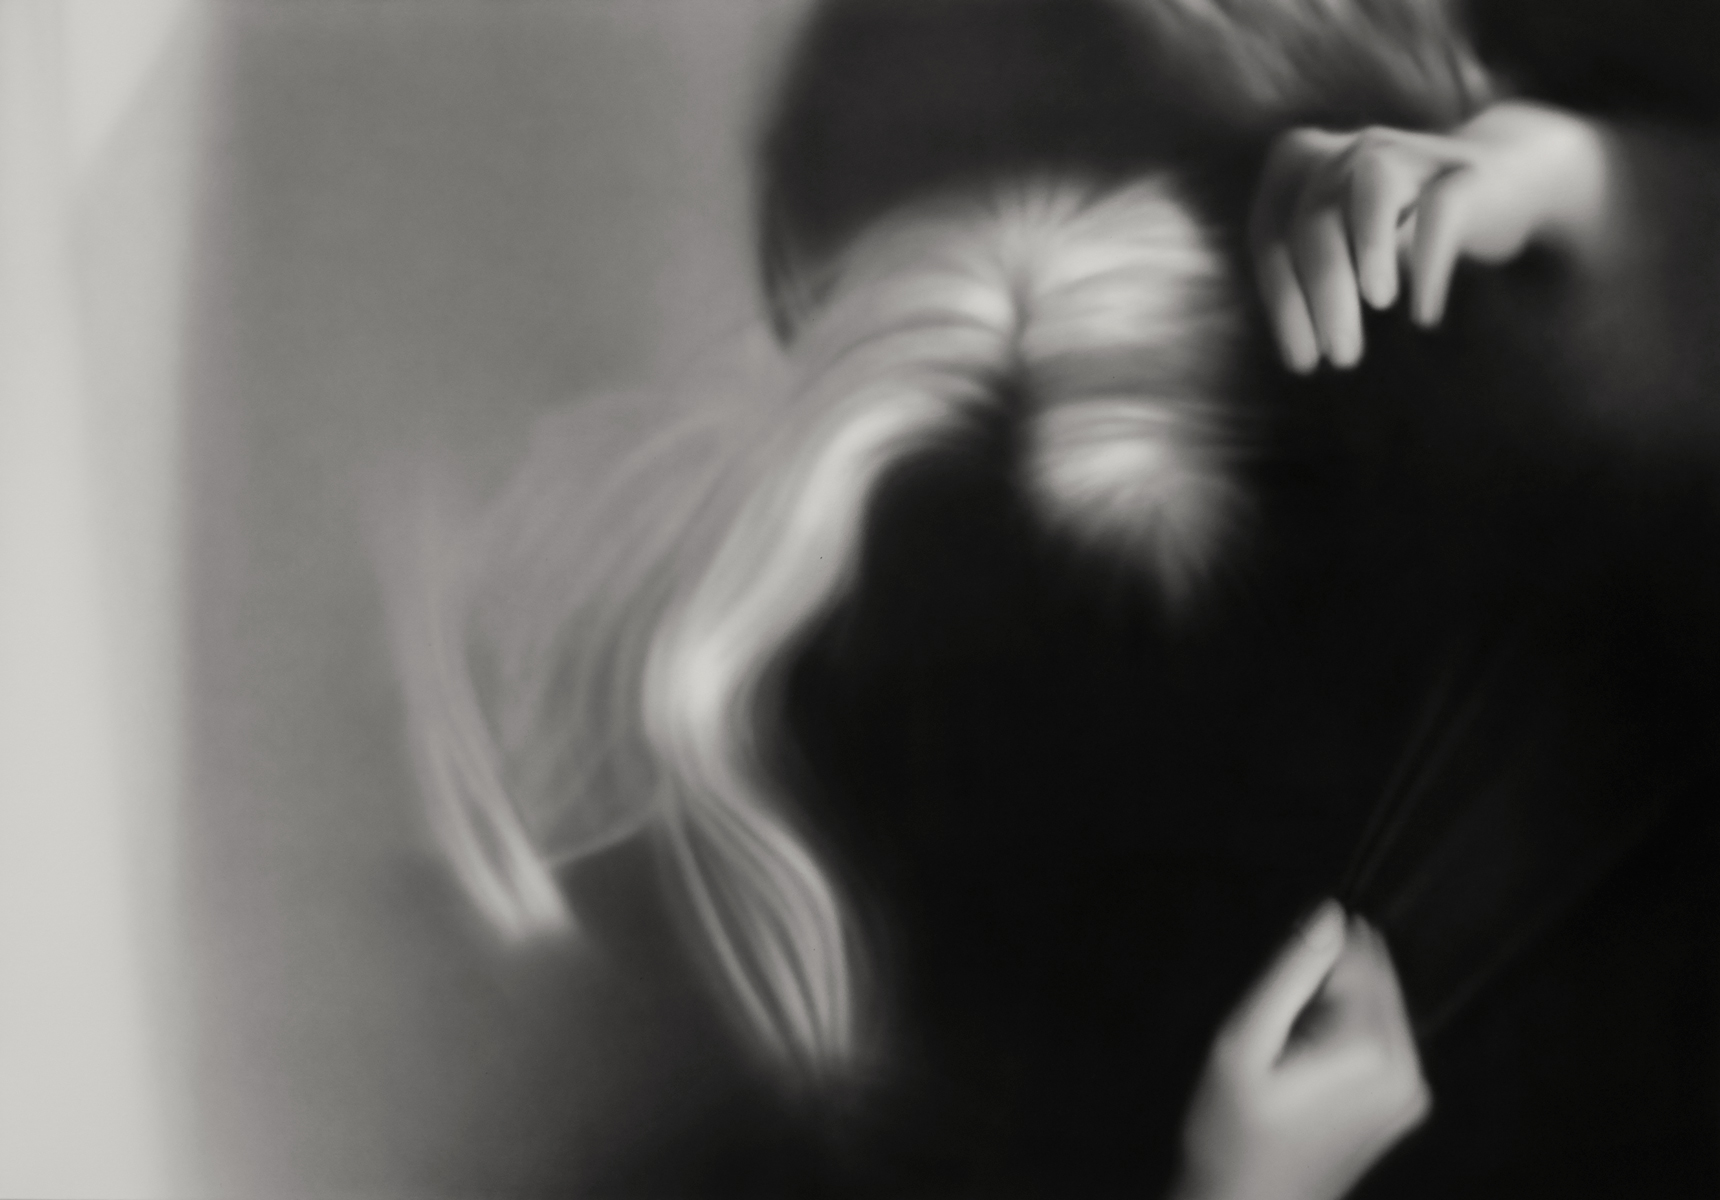 Hugo-Alonso-BLONDE-acrylic-painting-on-canvas-114-x-160-cms-WEB.jpg